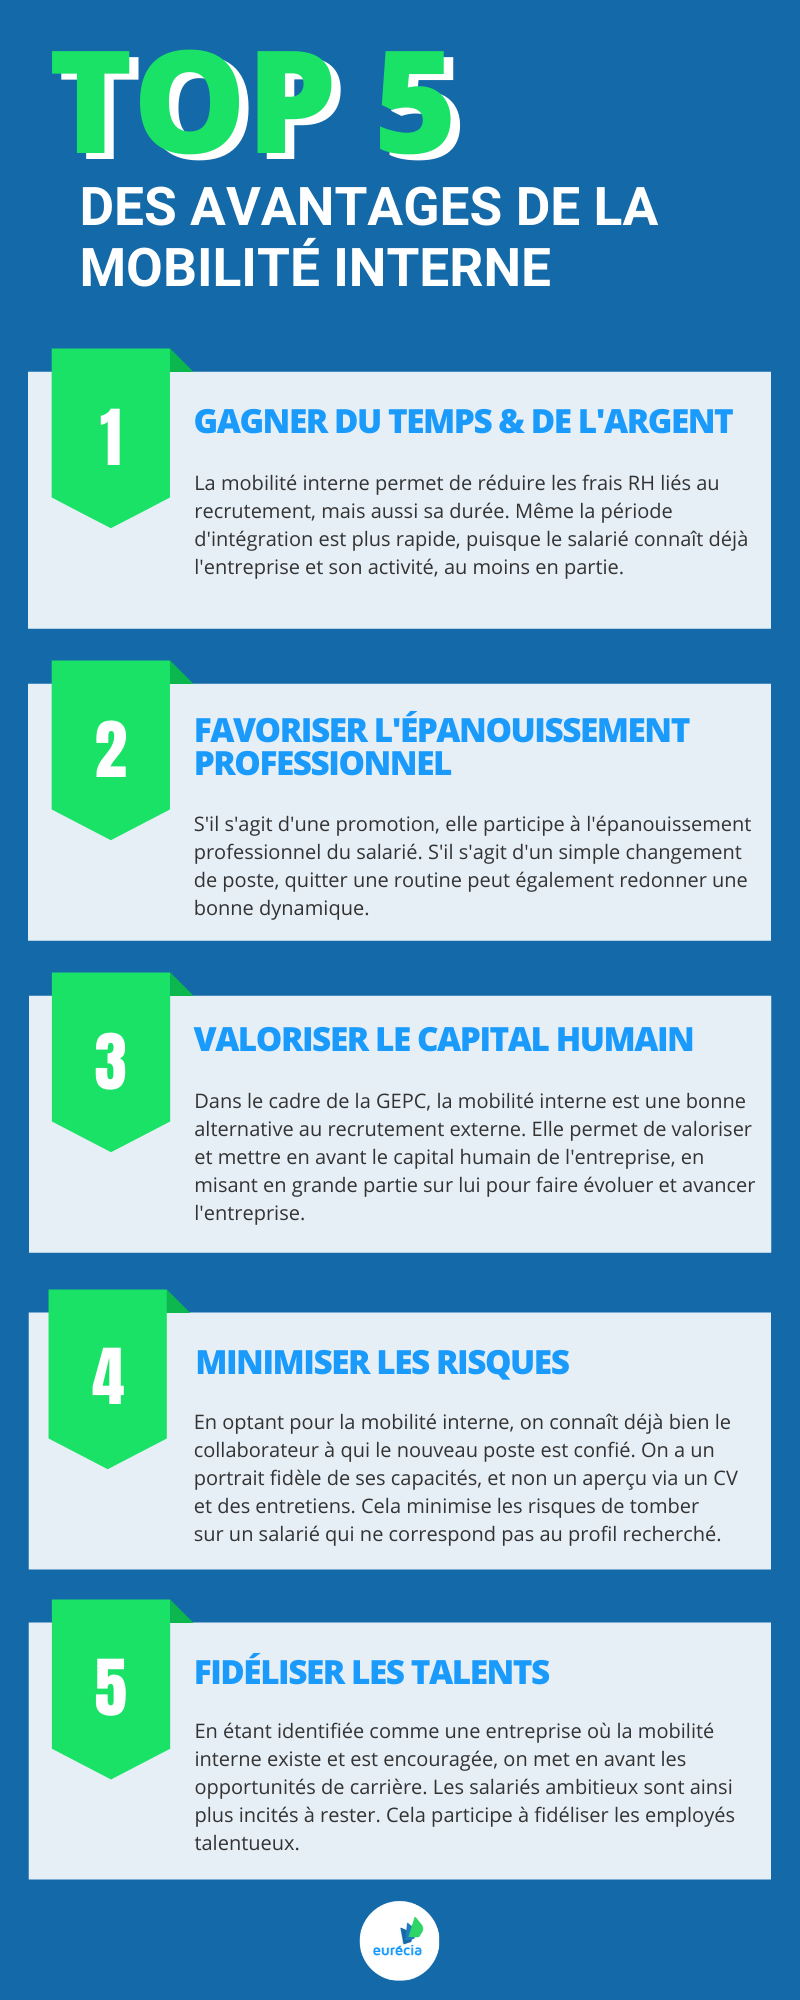 infographie_avantagesmobilite-interne_eurecia.png